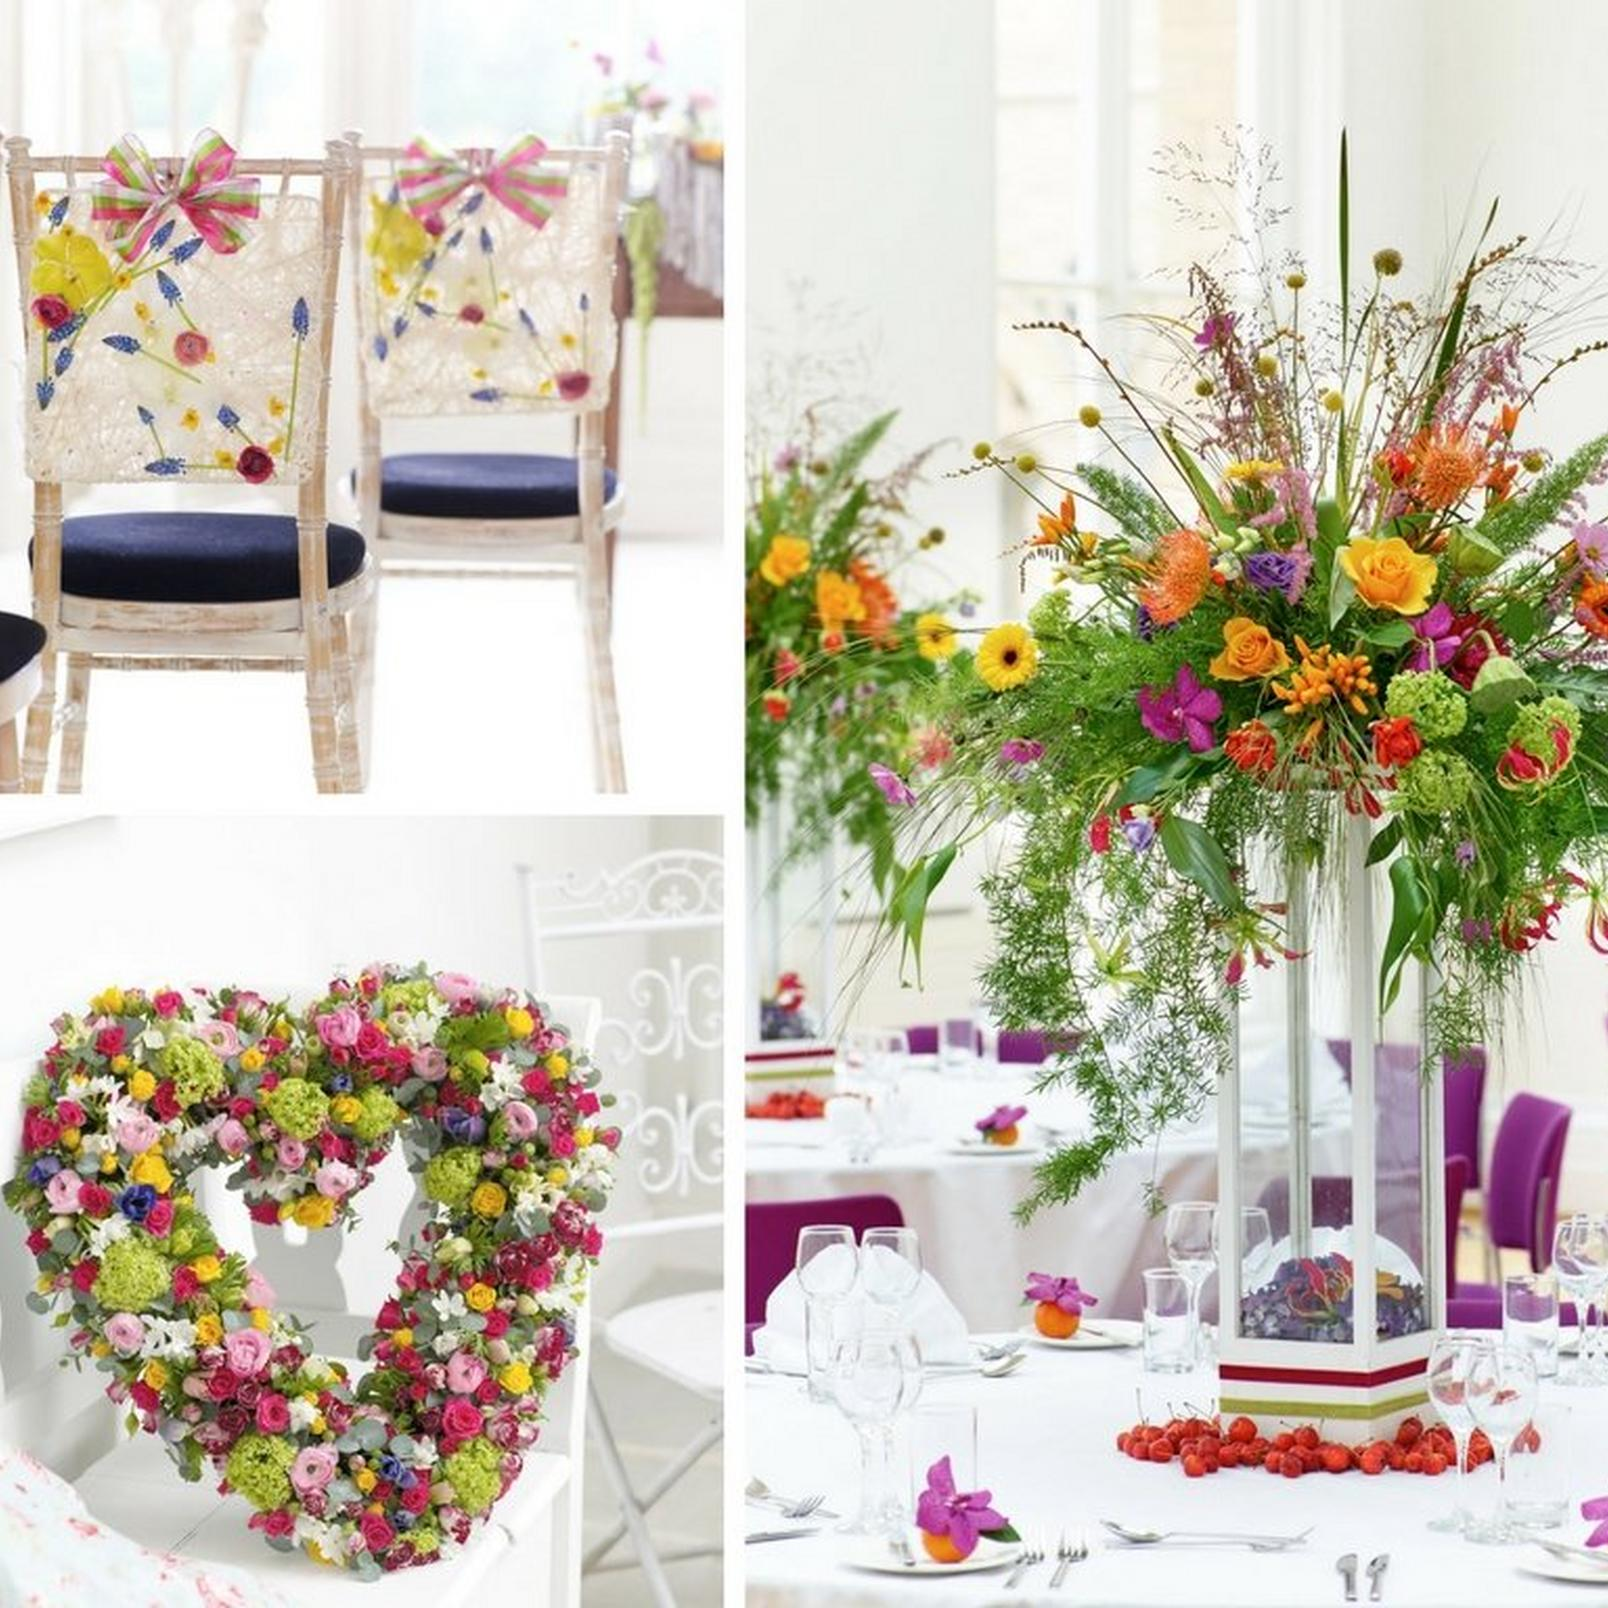 wedding-venue-flower-decorations-1